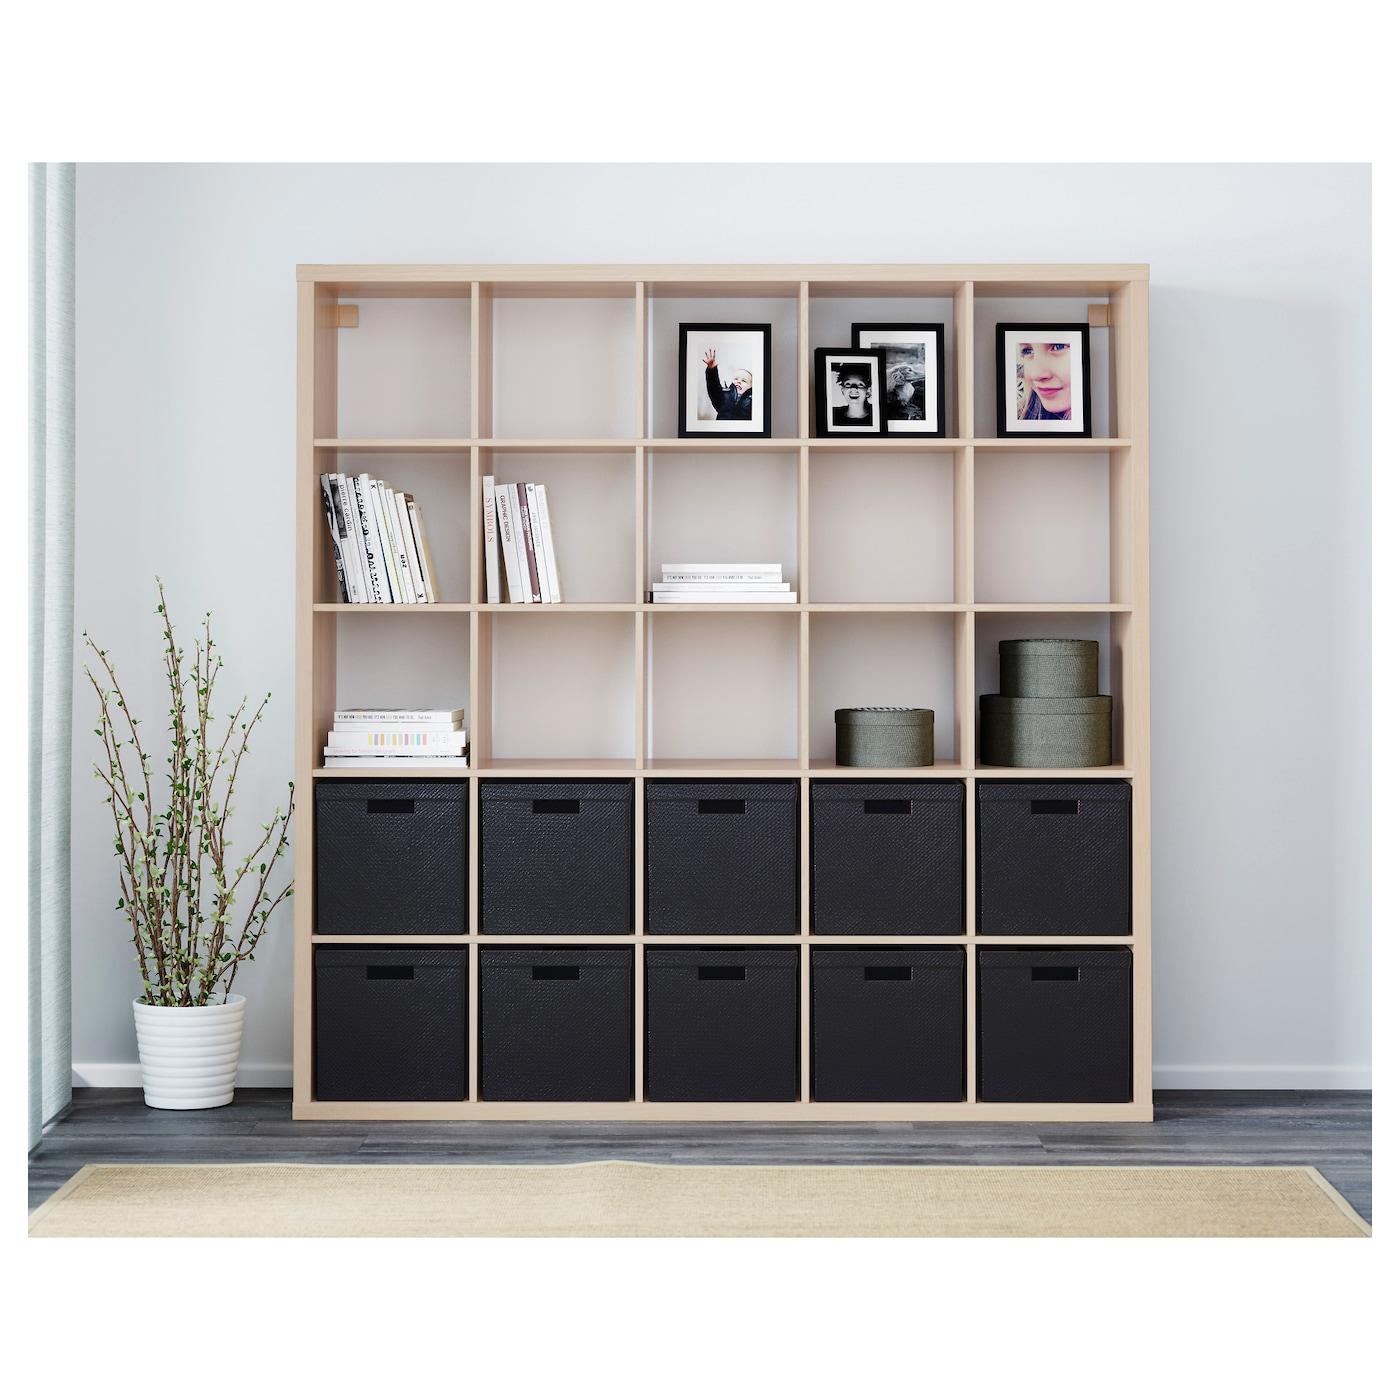 kallax tag re effet ch ne blanchi 182 x 182 cm ikea. Black Bedroom Furniture Sets. Home Design Ideas